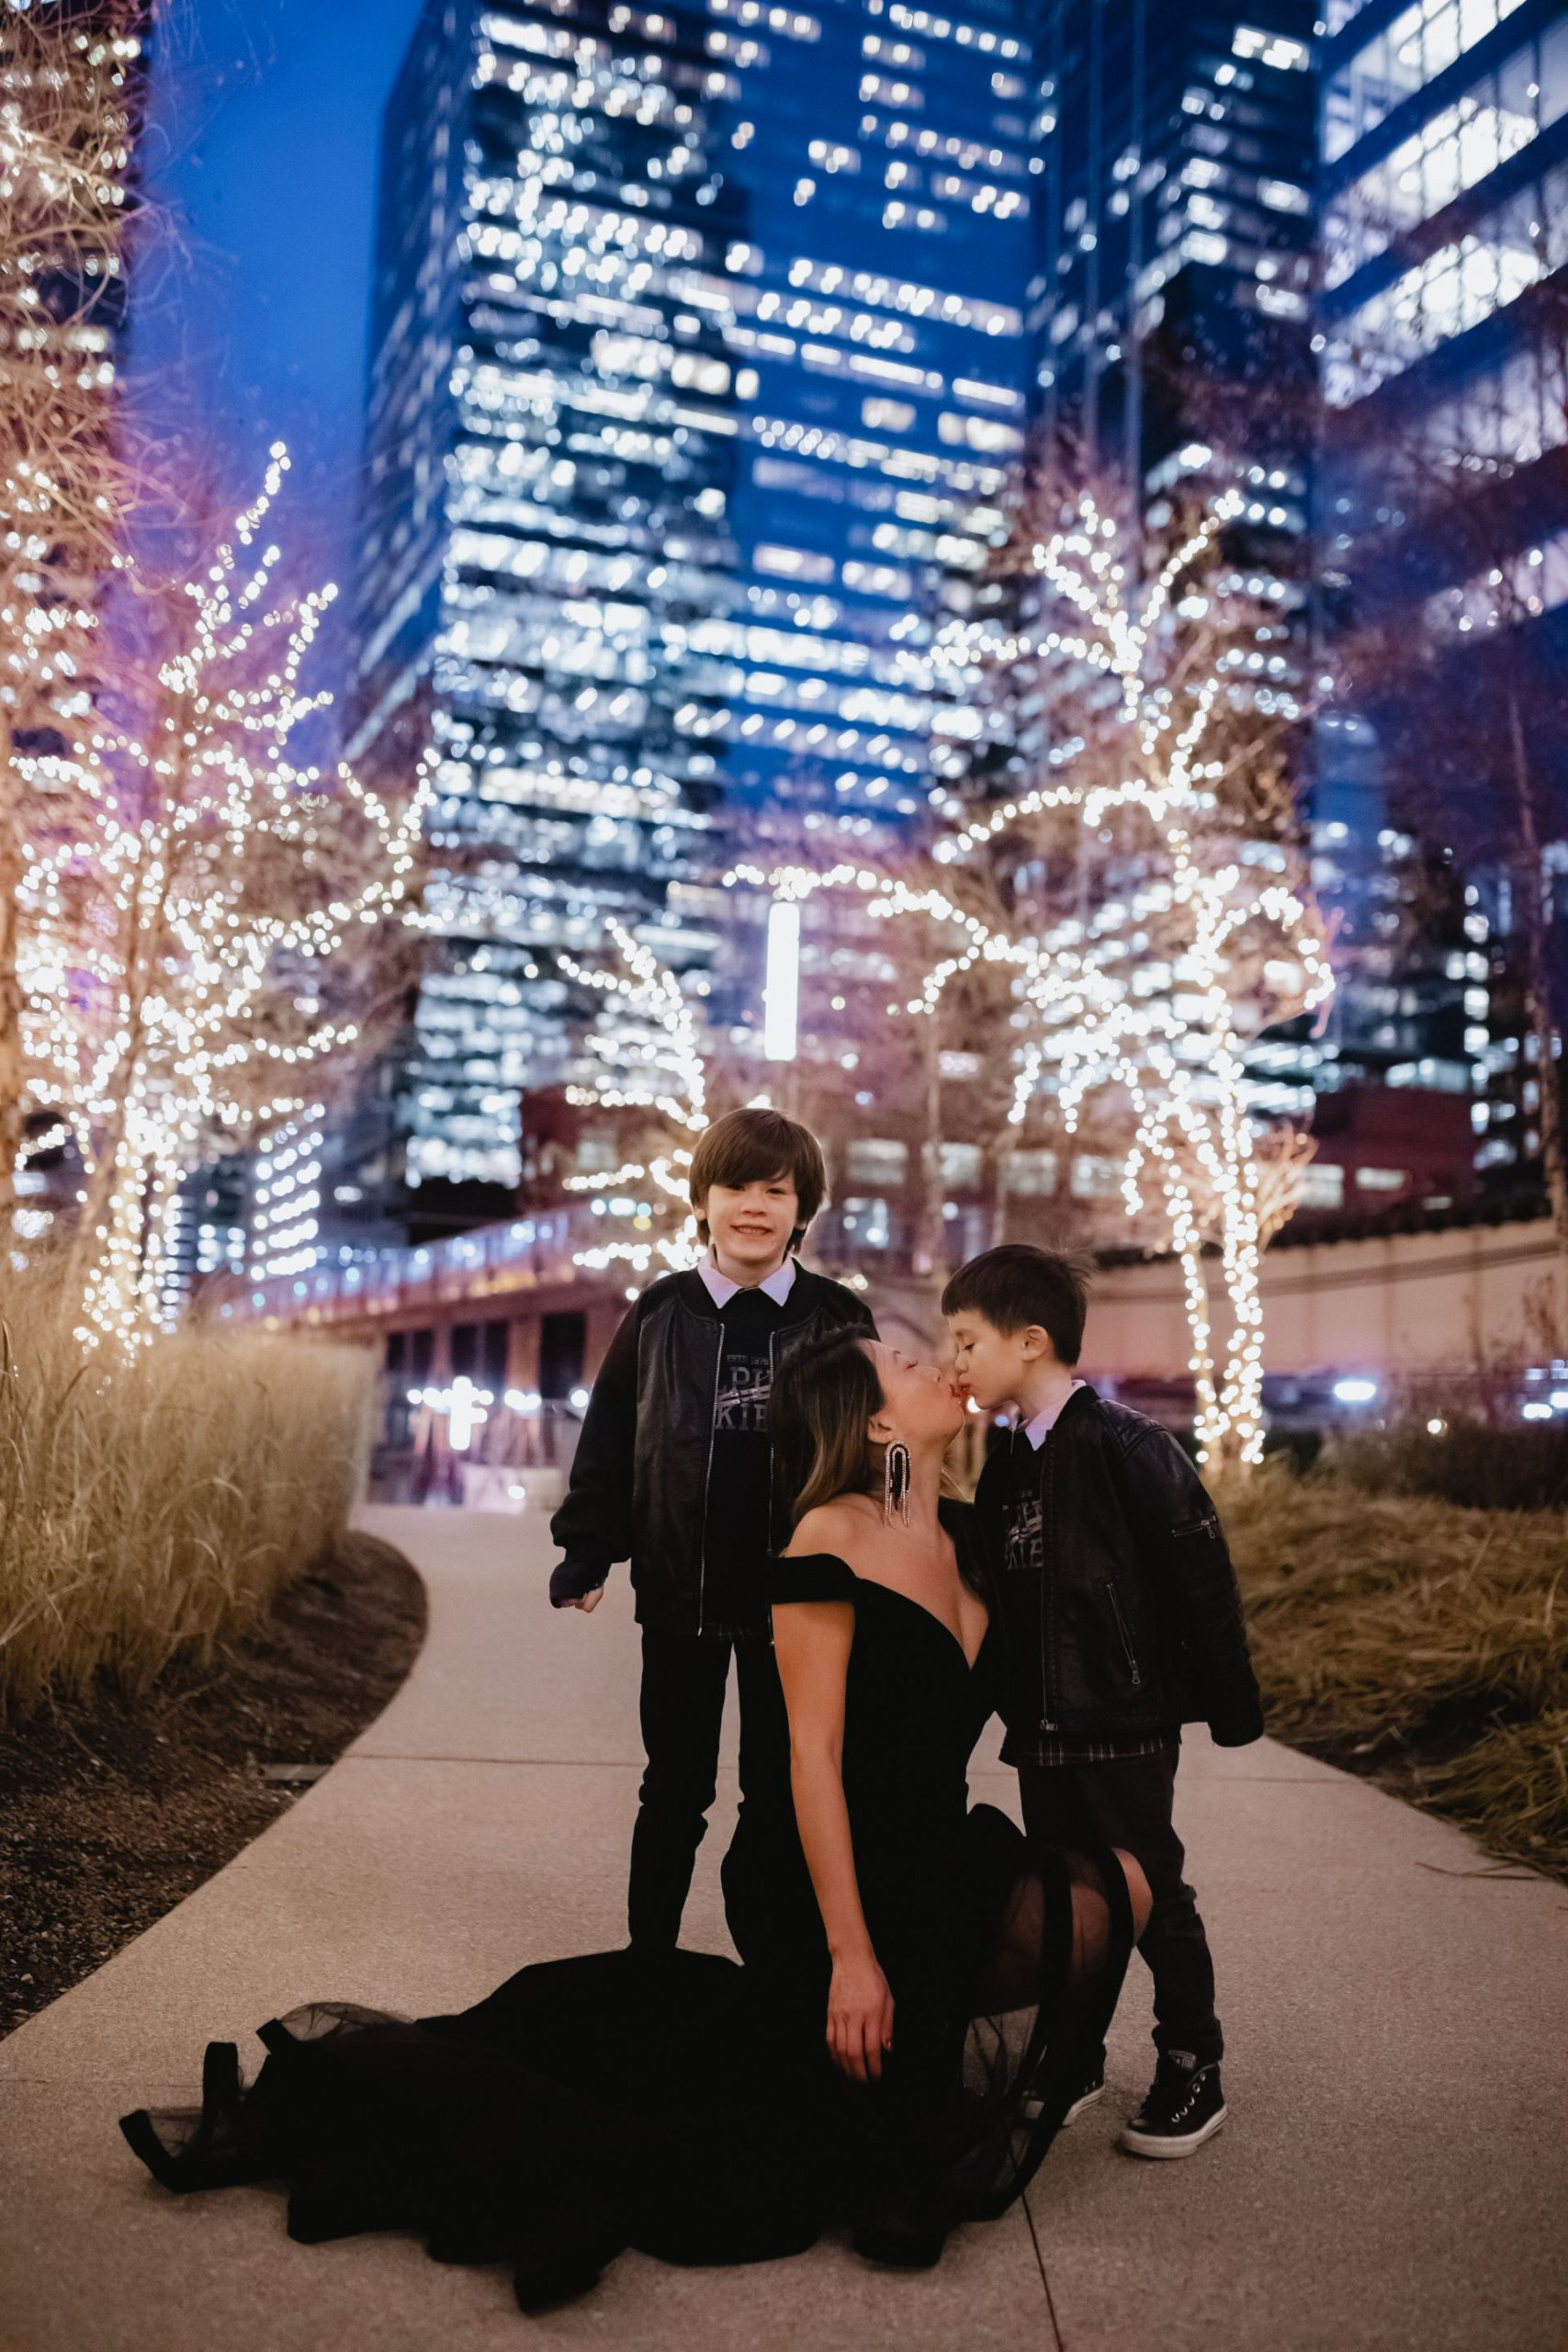 jennifer worman, chicago mom, raising two boys, holiday dress photos, best gala dress, macduggal velvet dress, holiday family photography, chicago fashion blogger